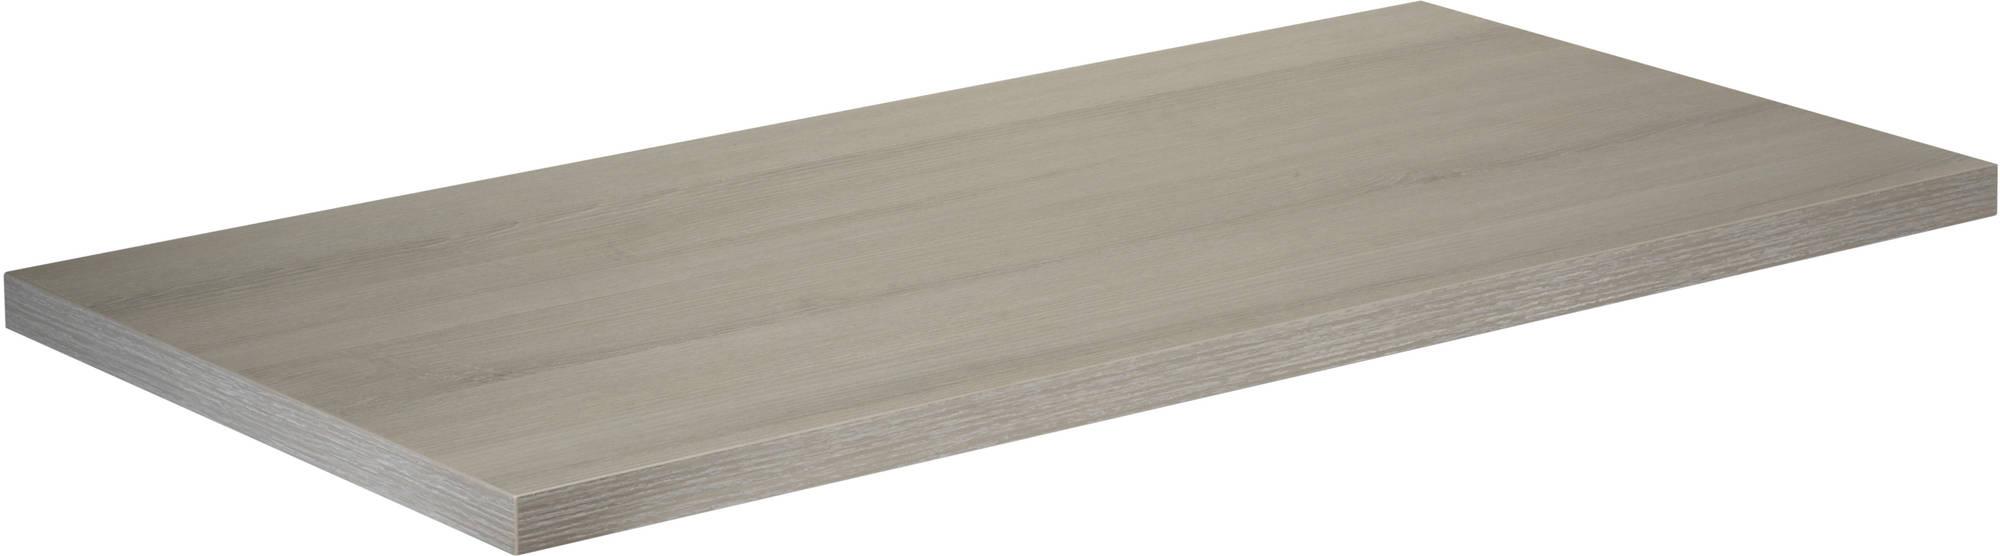 Saniselect Socan Wastafelblad 160x51,5cm Litho Grijs